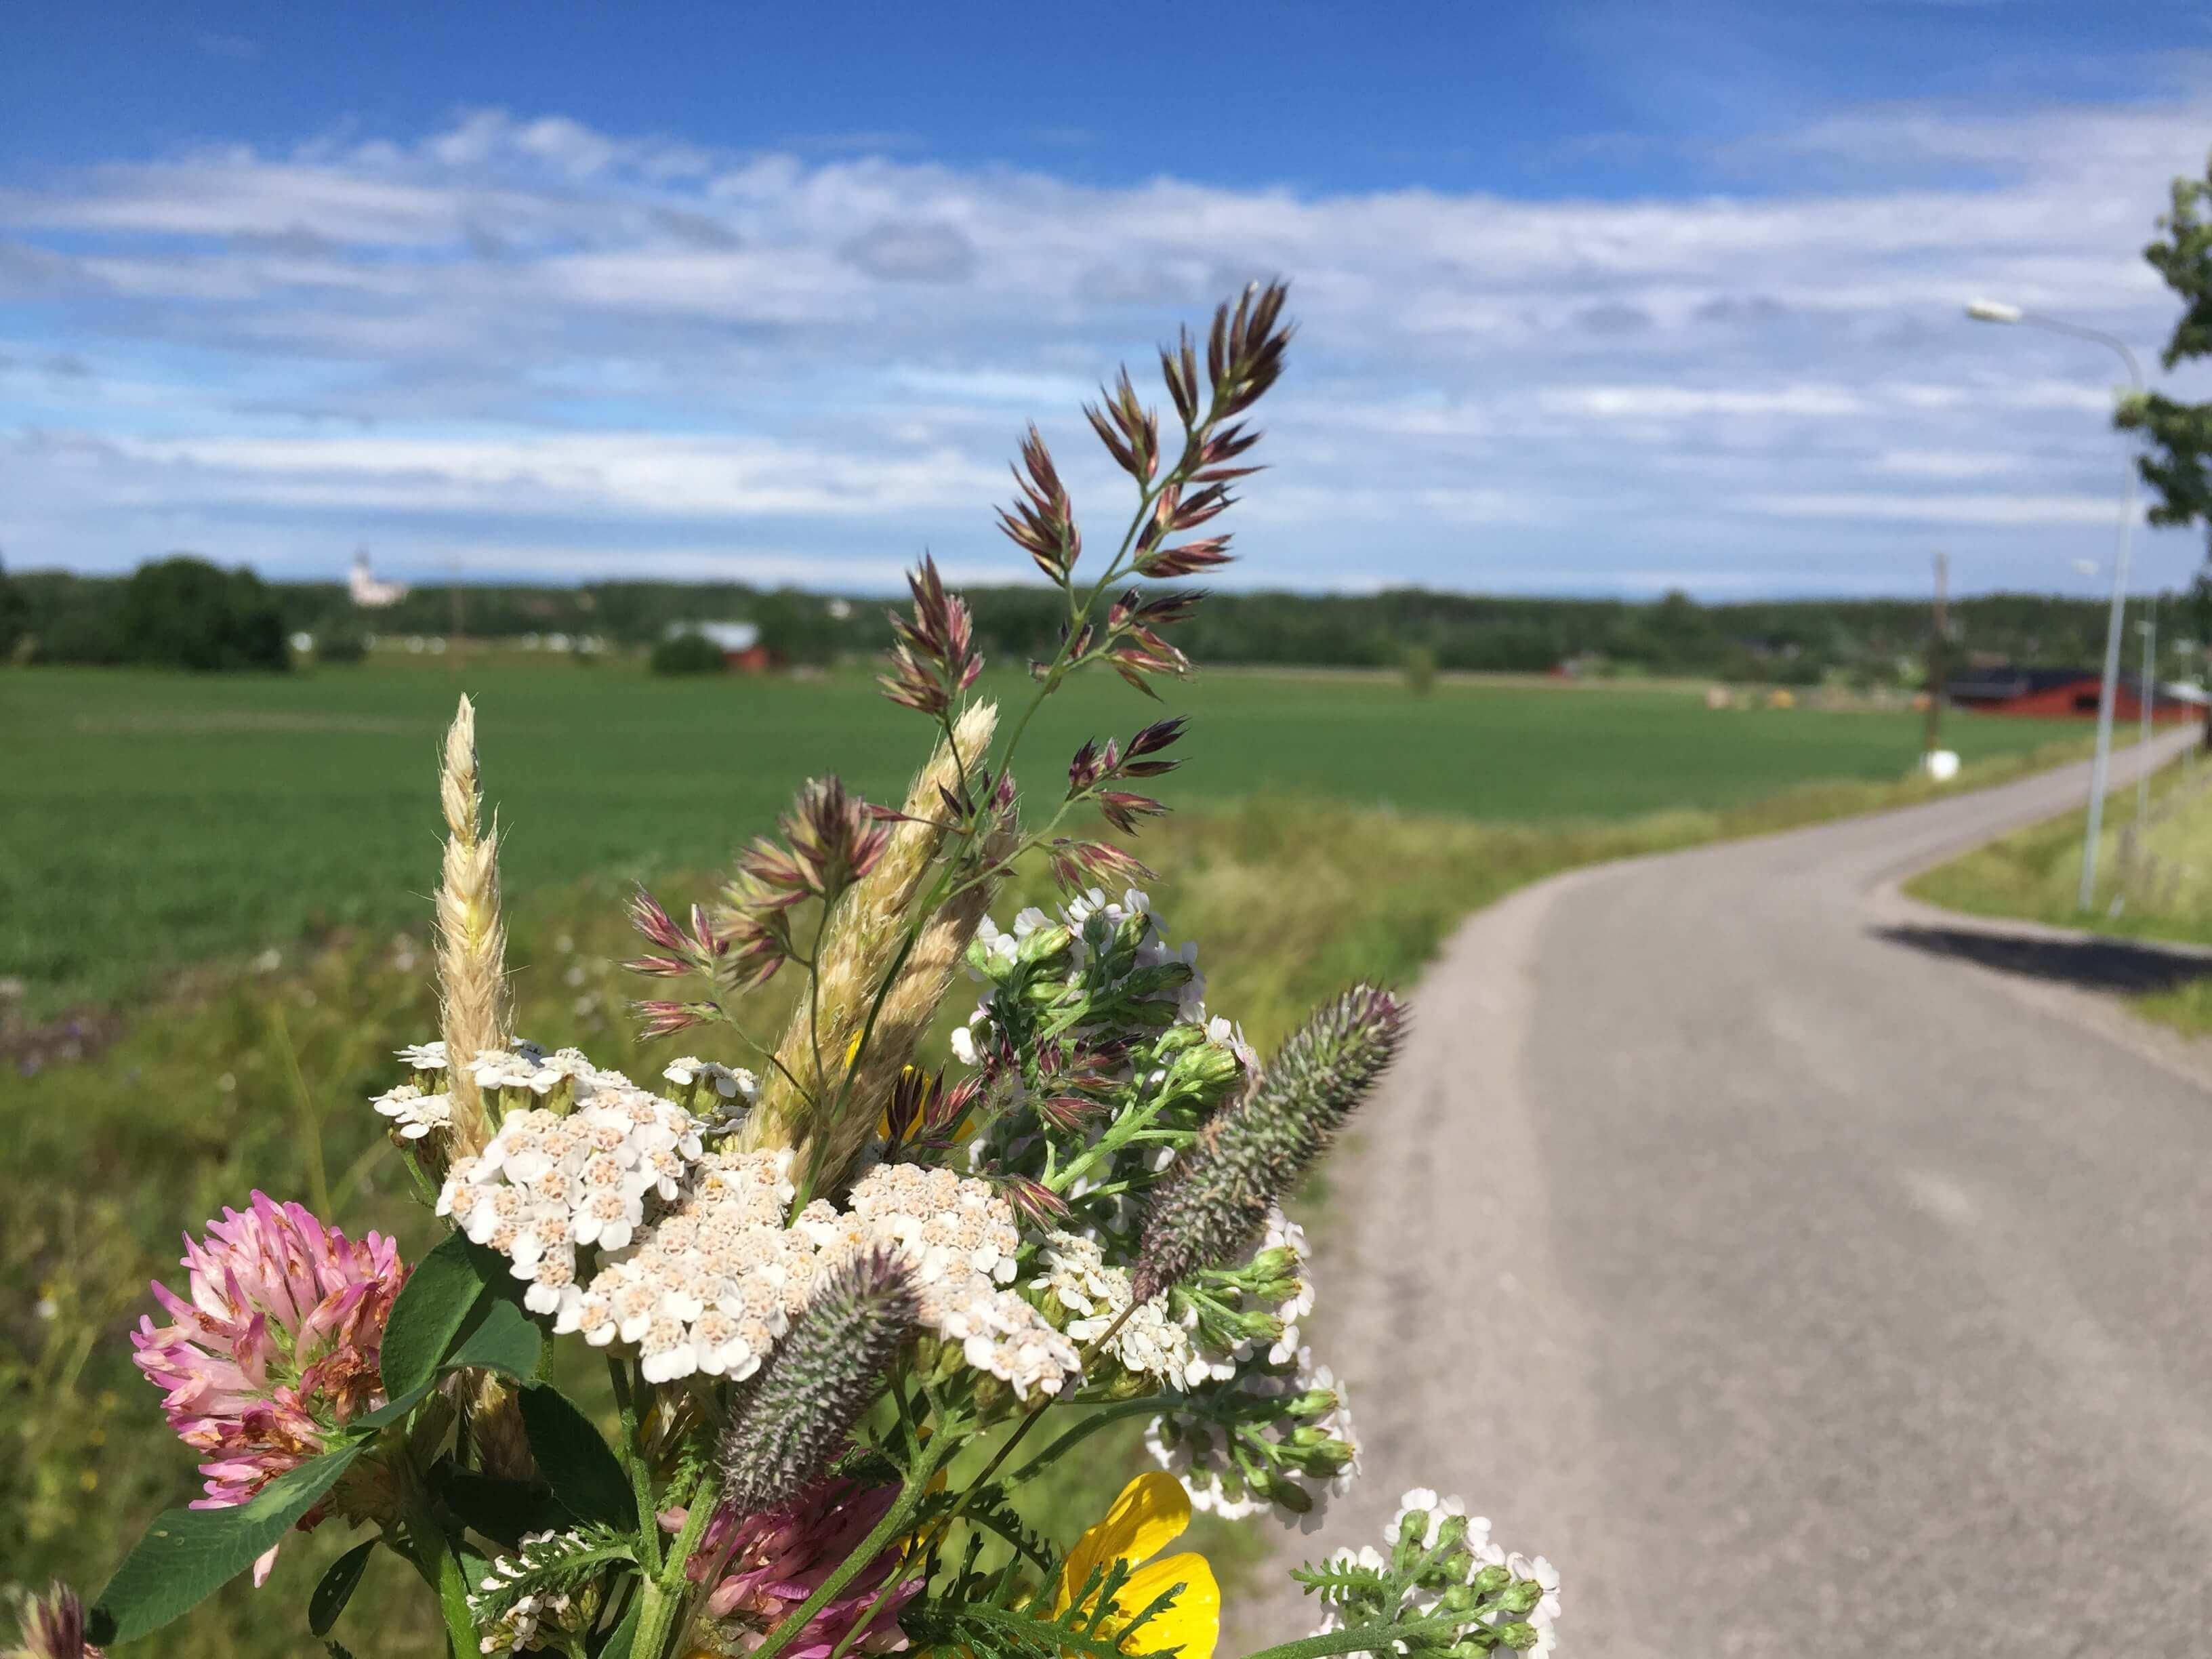 Midsummer In The Swedish Countryside Traversing Territories